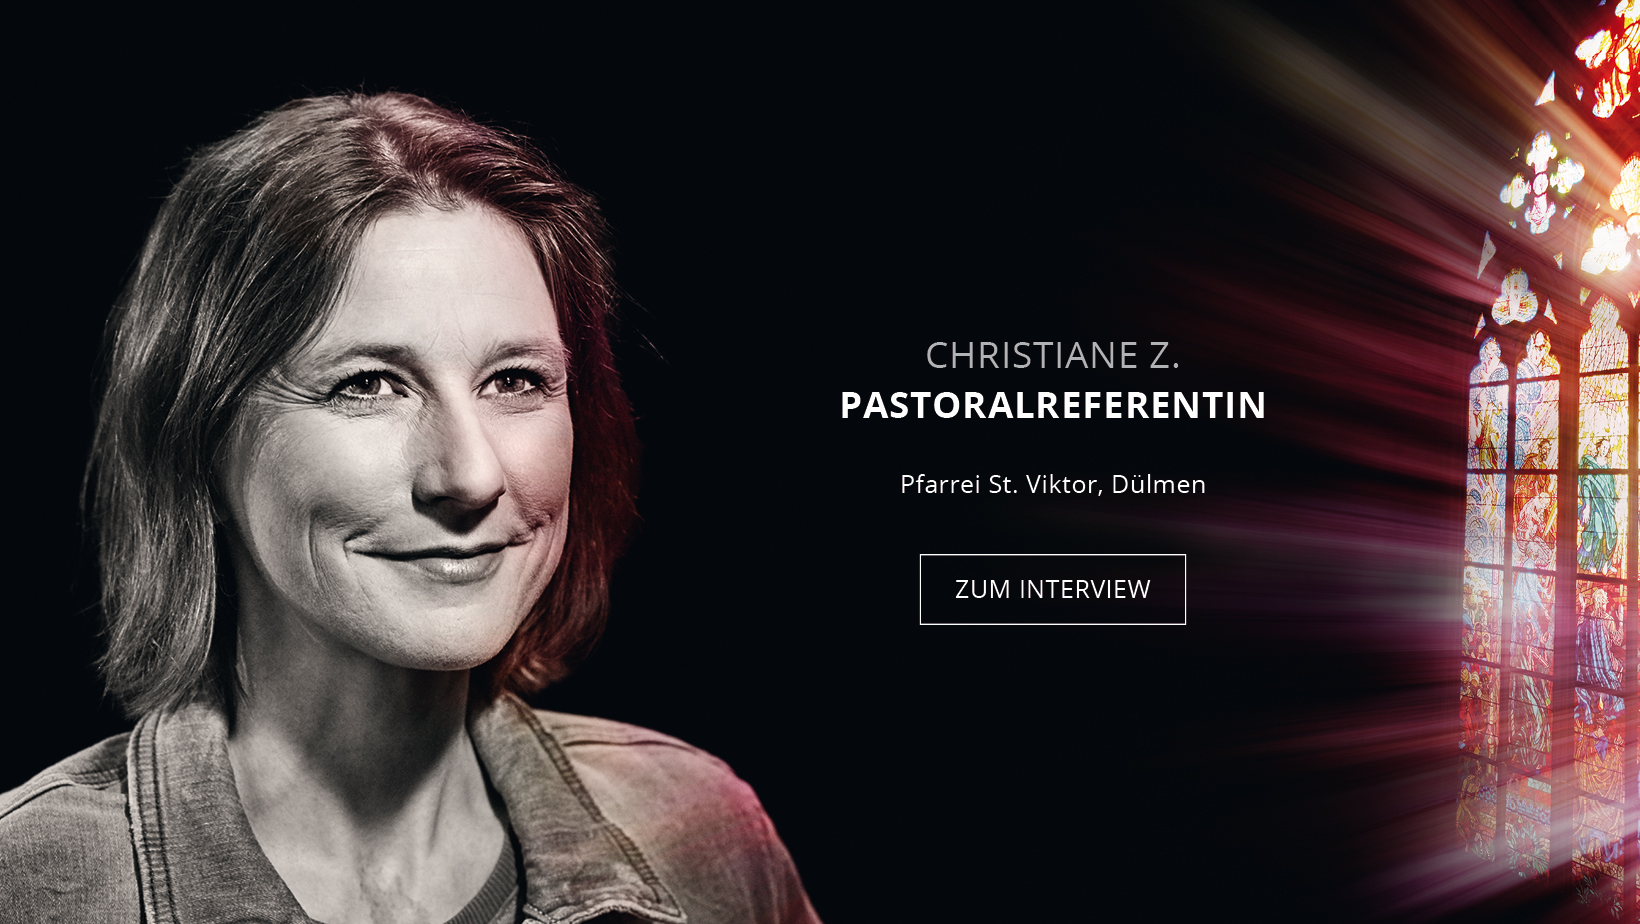 Pastoralreferentin Christiane Zirpel